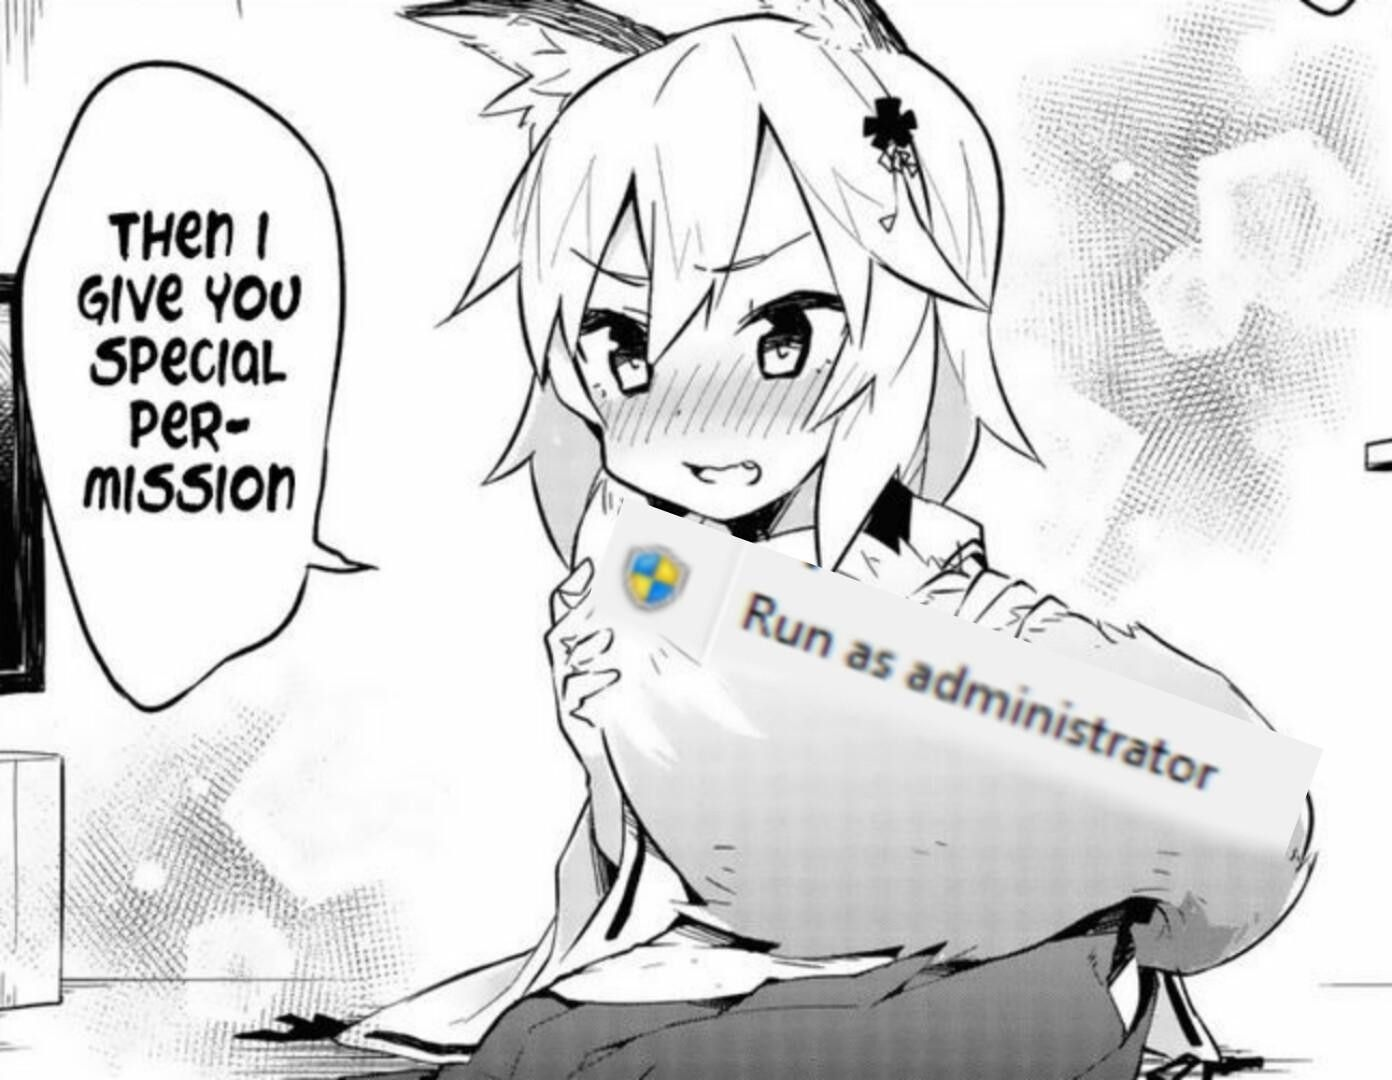 Pin By Phoenixmarkus On Dakimakura Pillow Anime Memes Anime